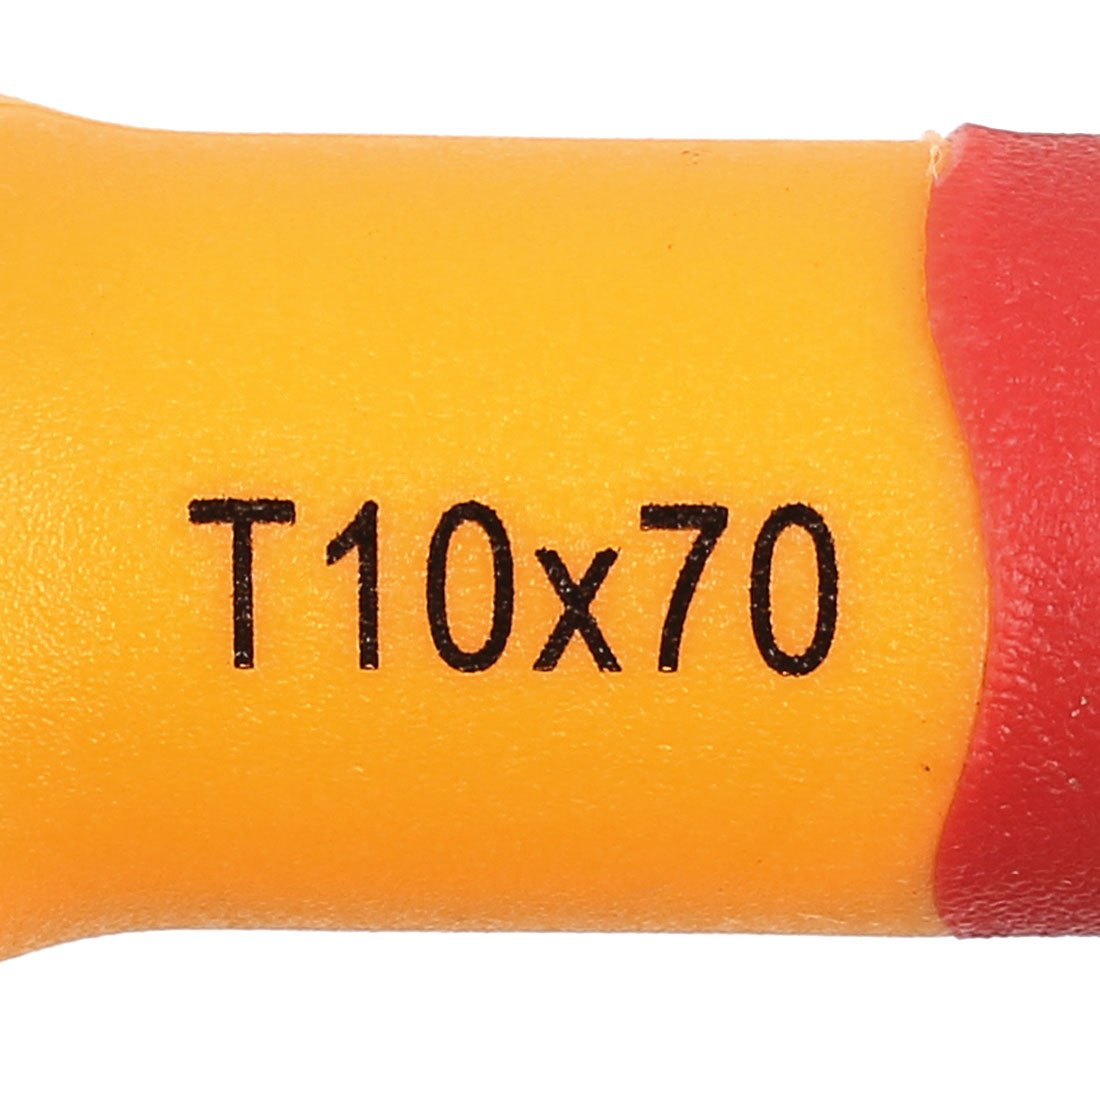 sourcingmap/® BOOHER Autorisiert 1000V 4mm Tip Breite VDE isoliert Schlitzschraubendreher de